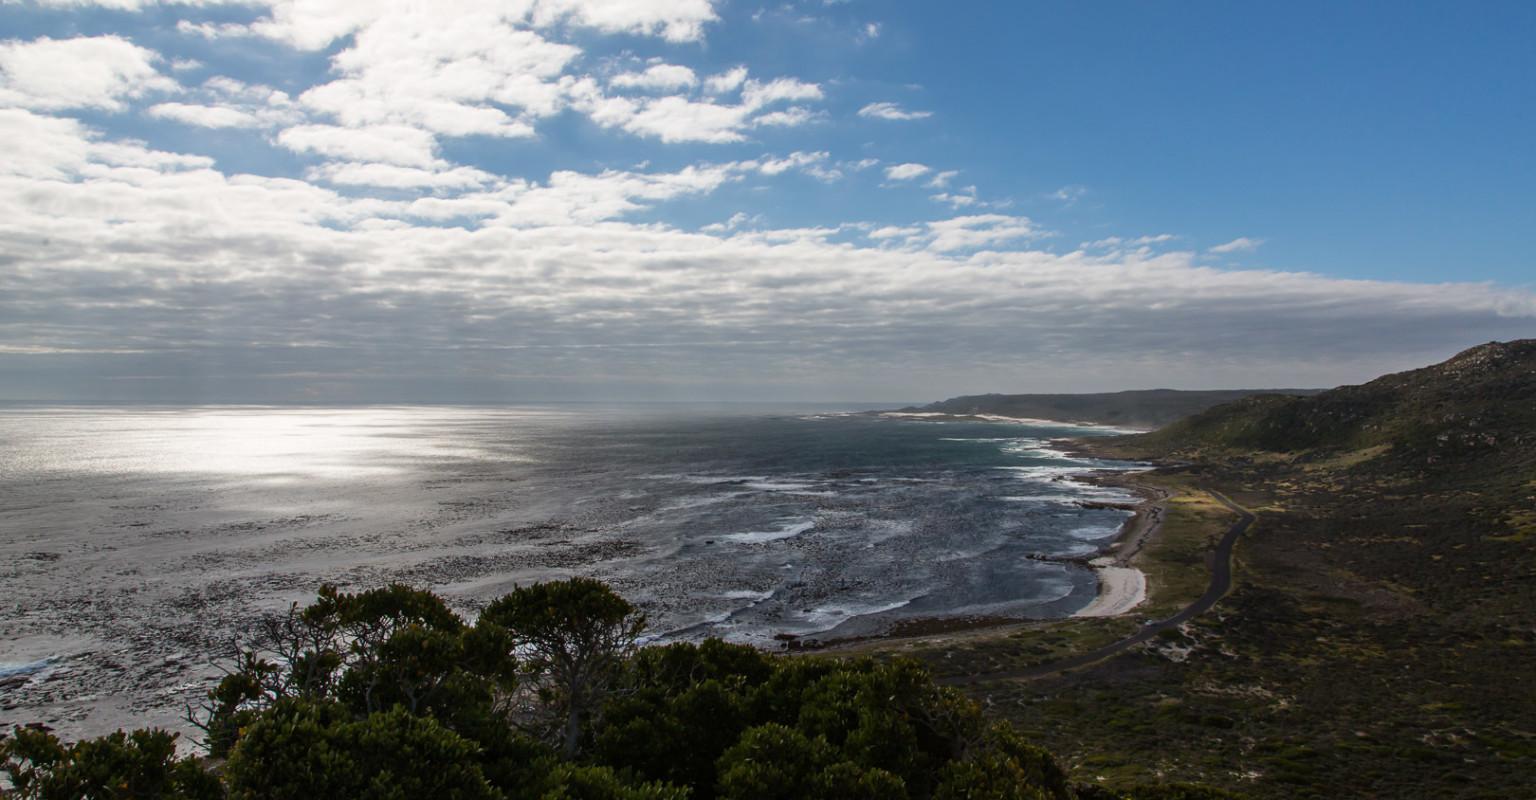 29.10. Cape Tour - Cape of Good Hope